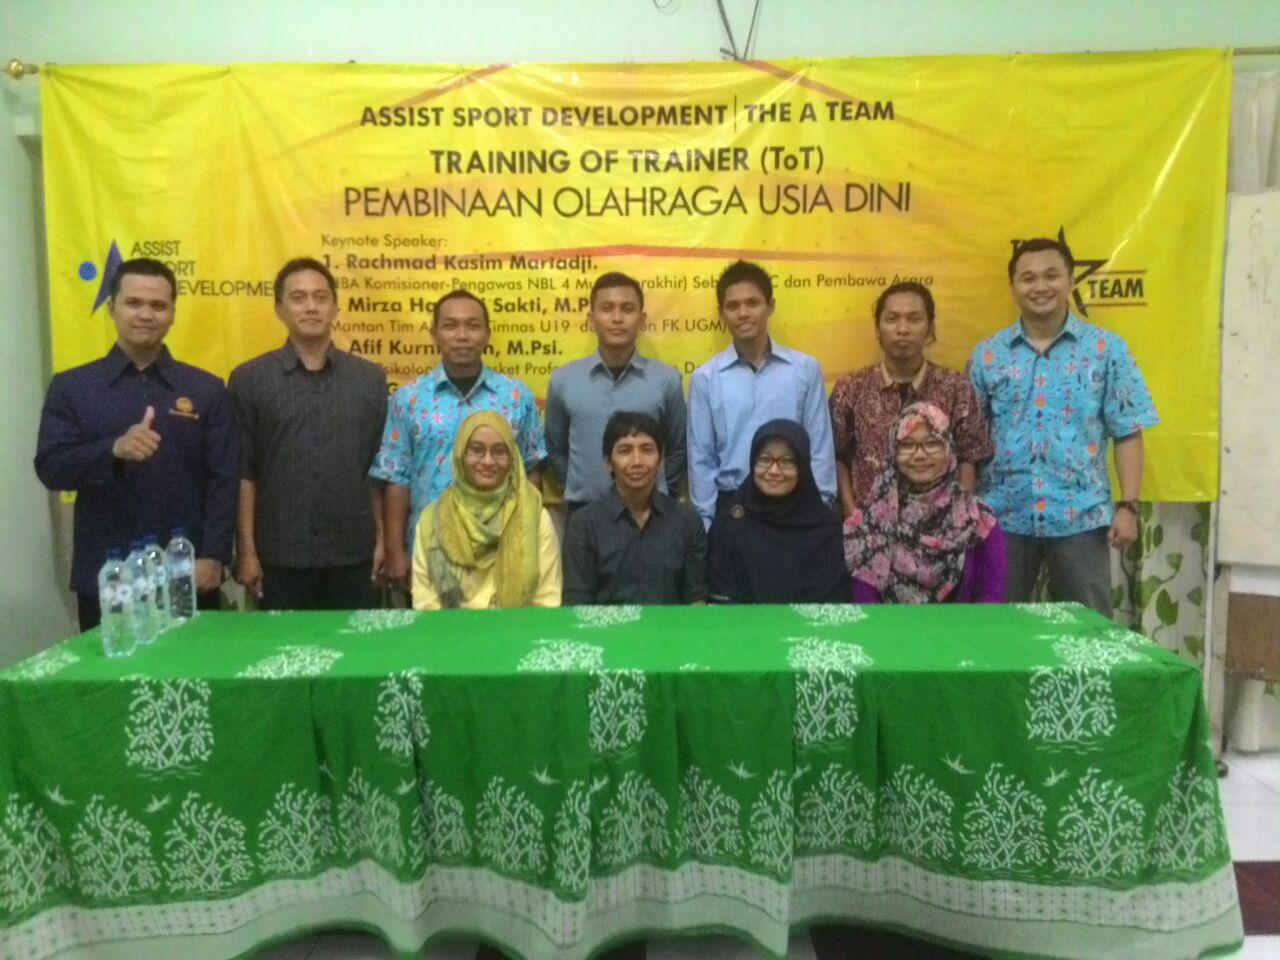 Berbagai profesi dalam Assist Sport Development Program (Training of Trainer Pembinaan Olahraga Usia Dini)